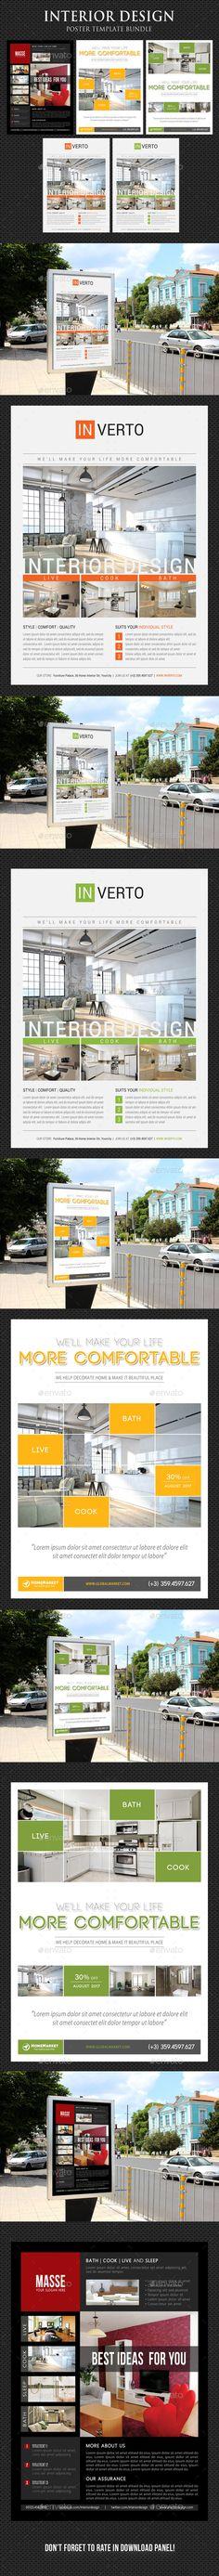 3 in 1 Interior Design Poster Template PSD Bundle